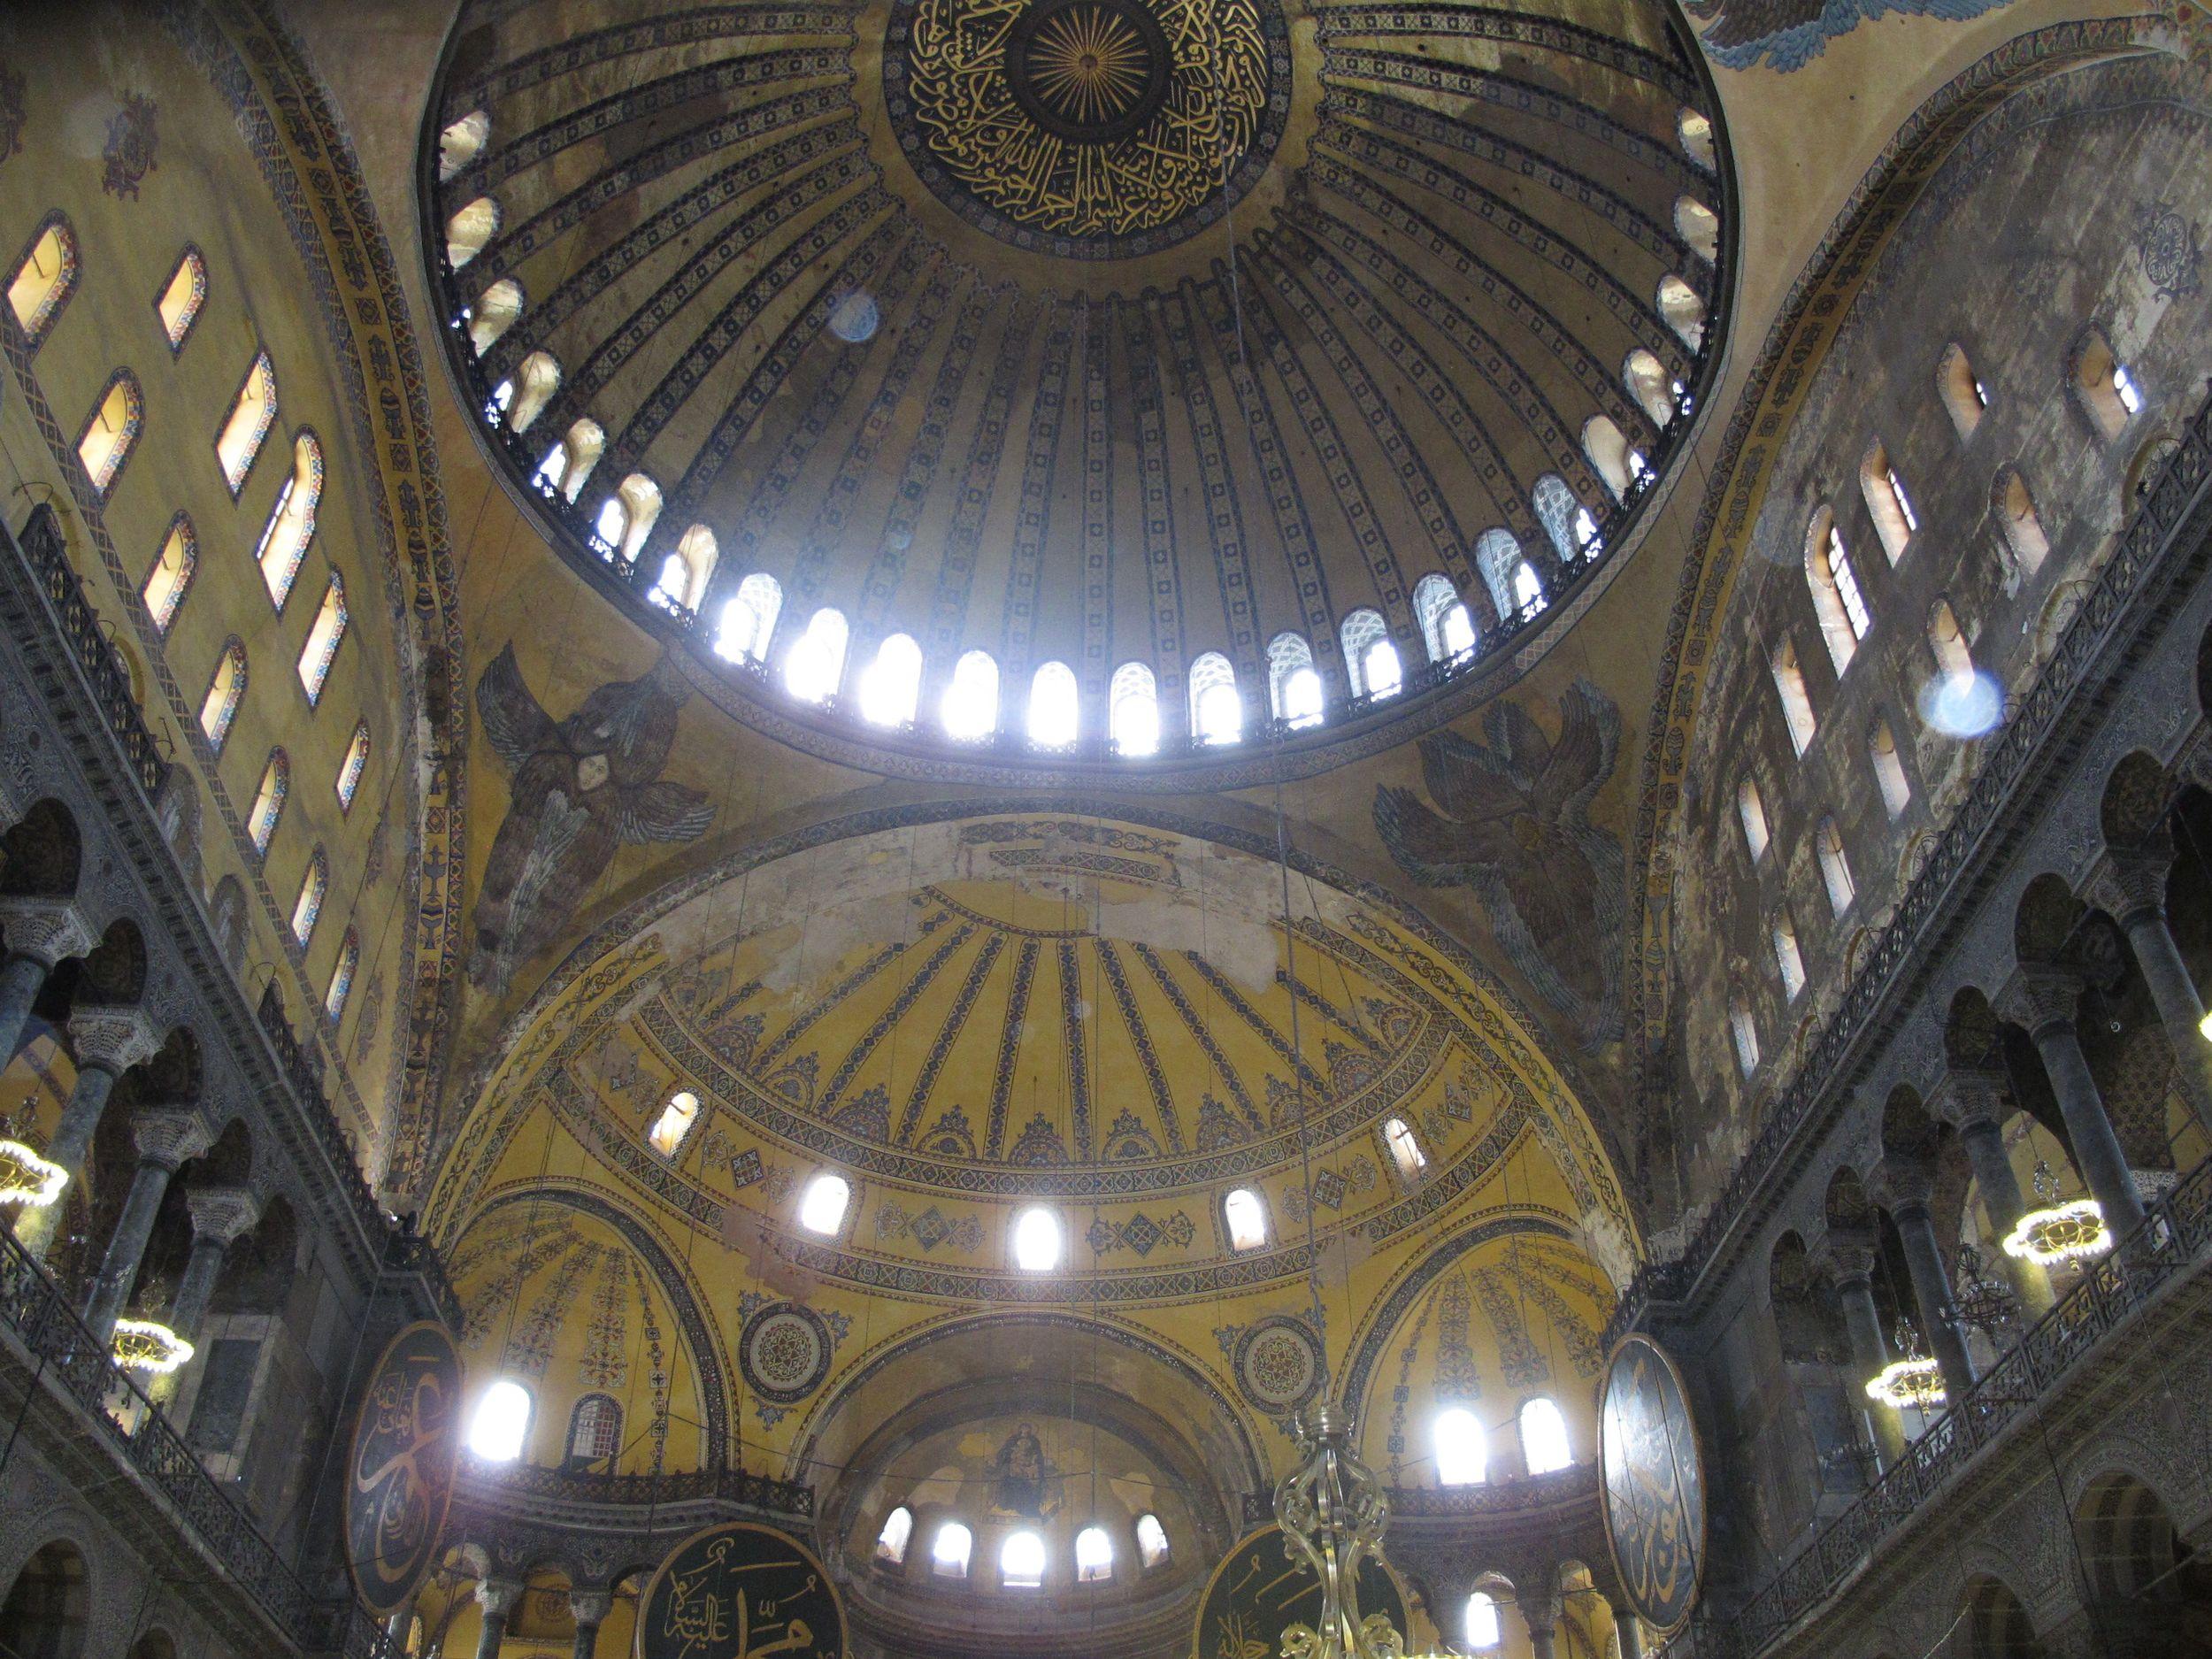 Inside the Hagia Sofia, Istanbul. Photo by Kim Kash